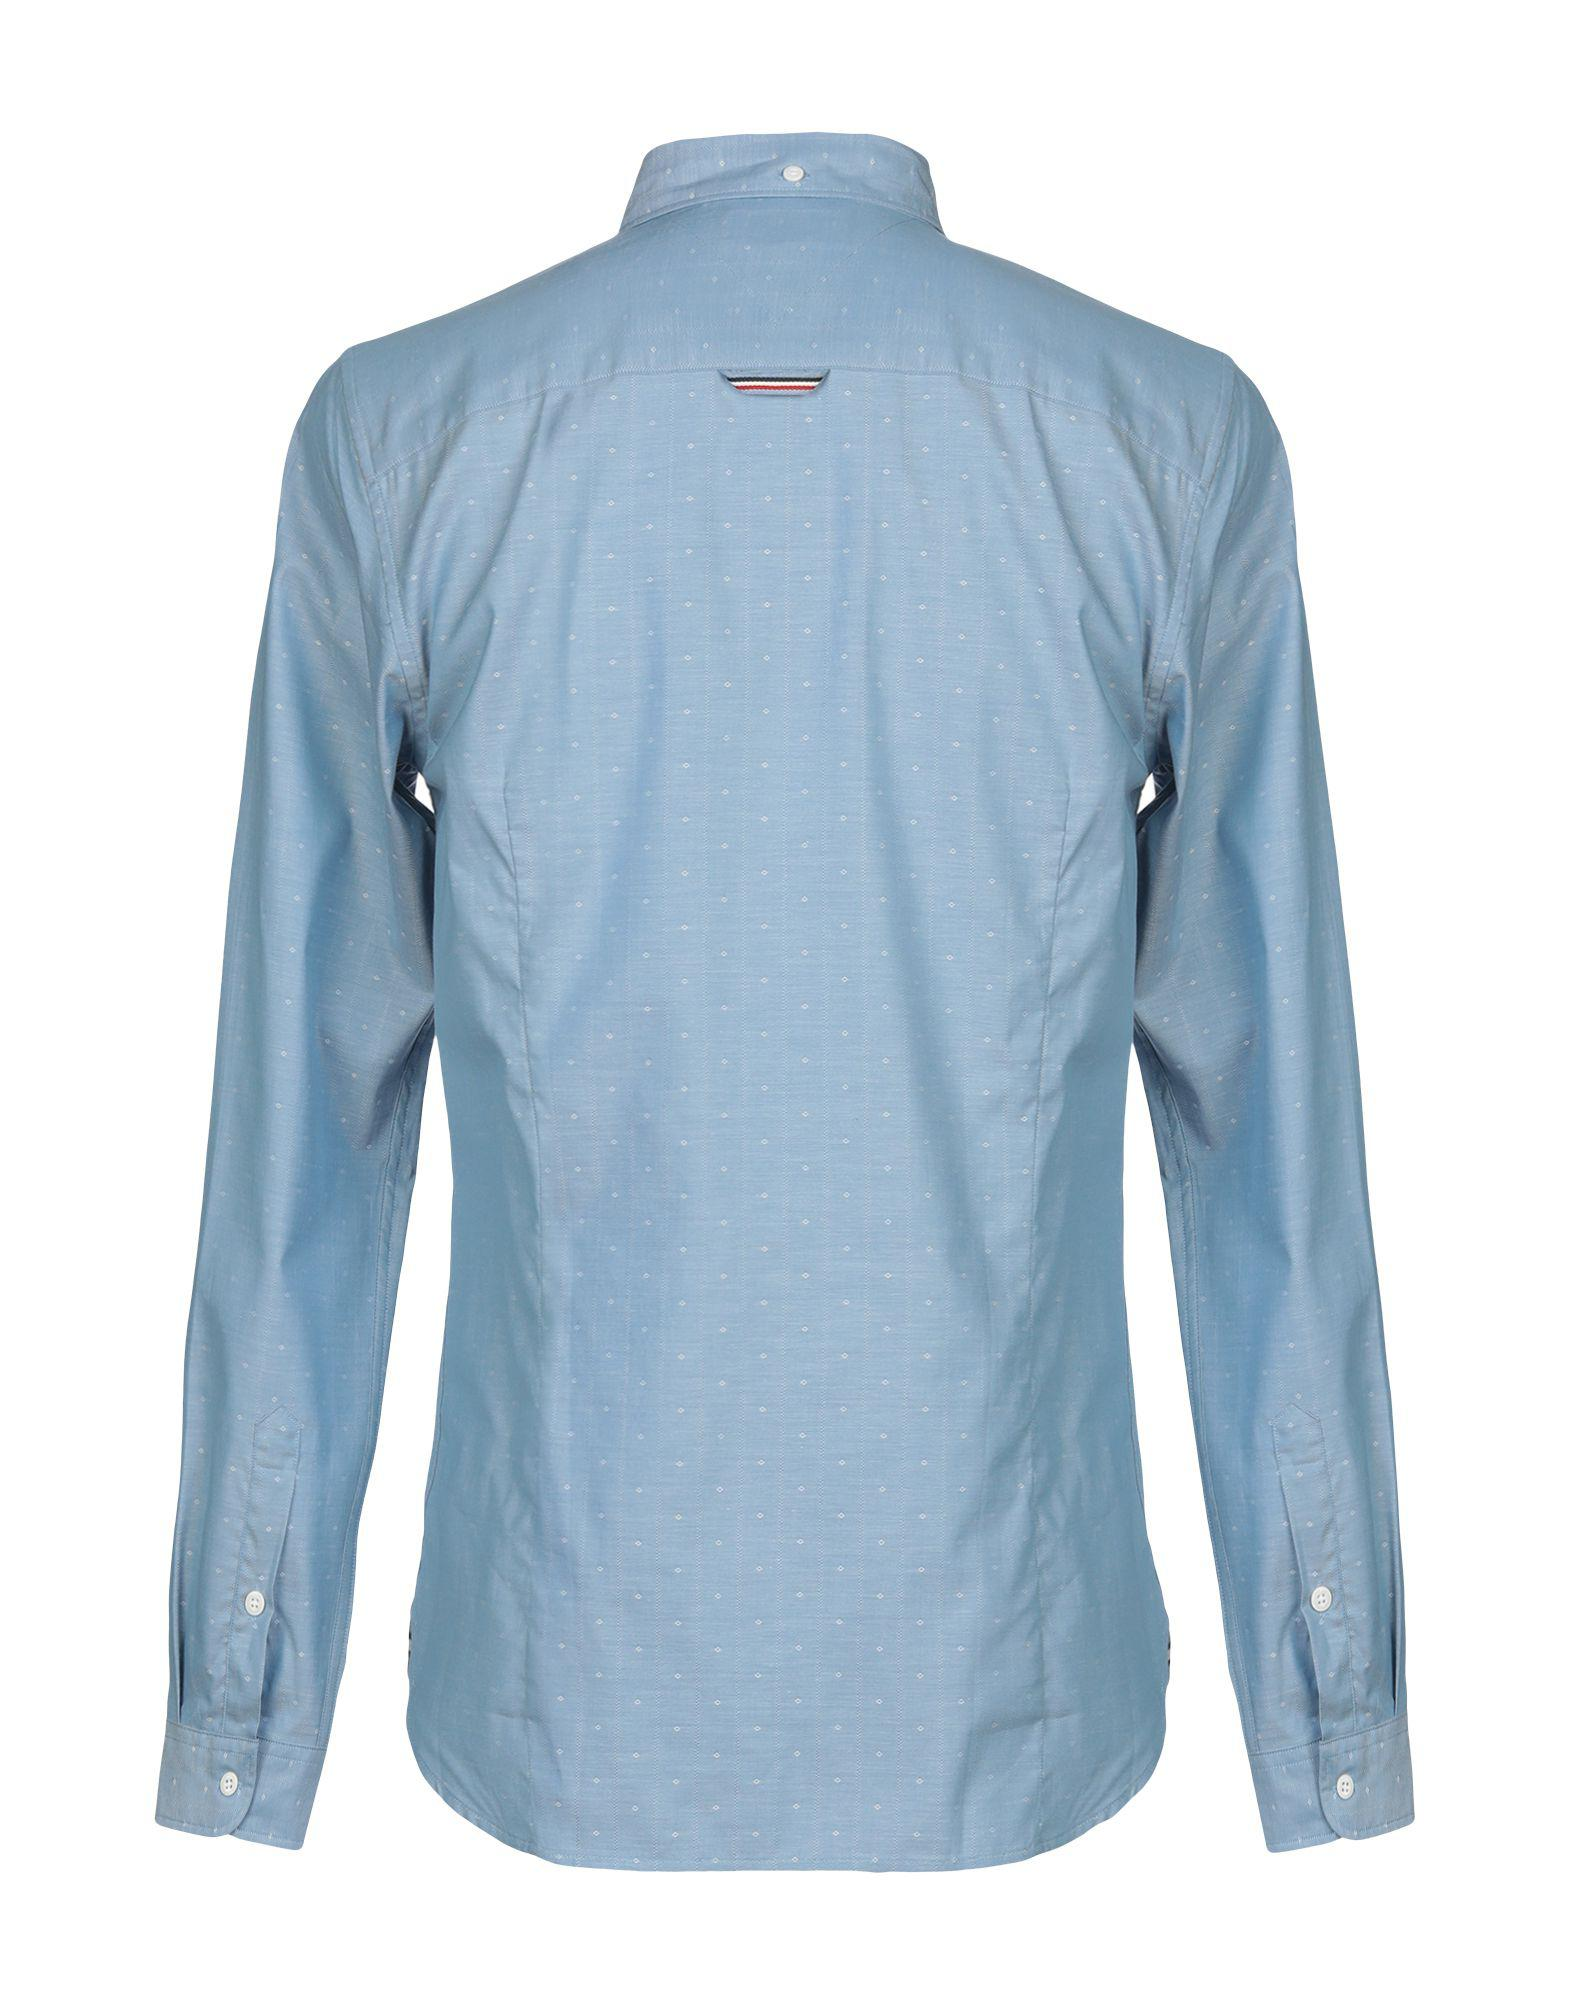 c07c590319466d Lyst - Tommy Hilfiger Shirt in Blue for Men